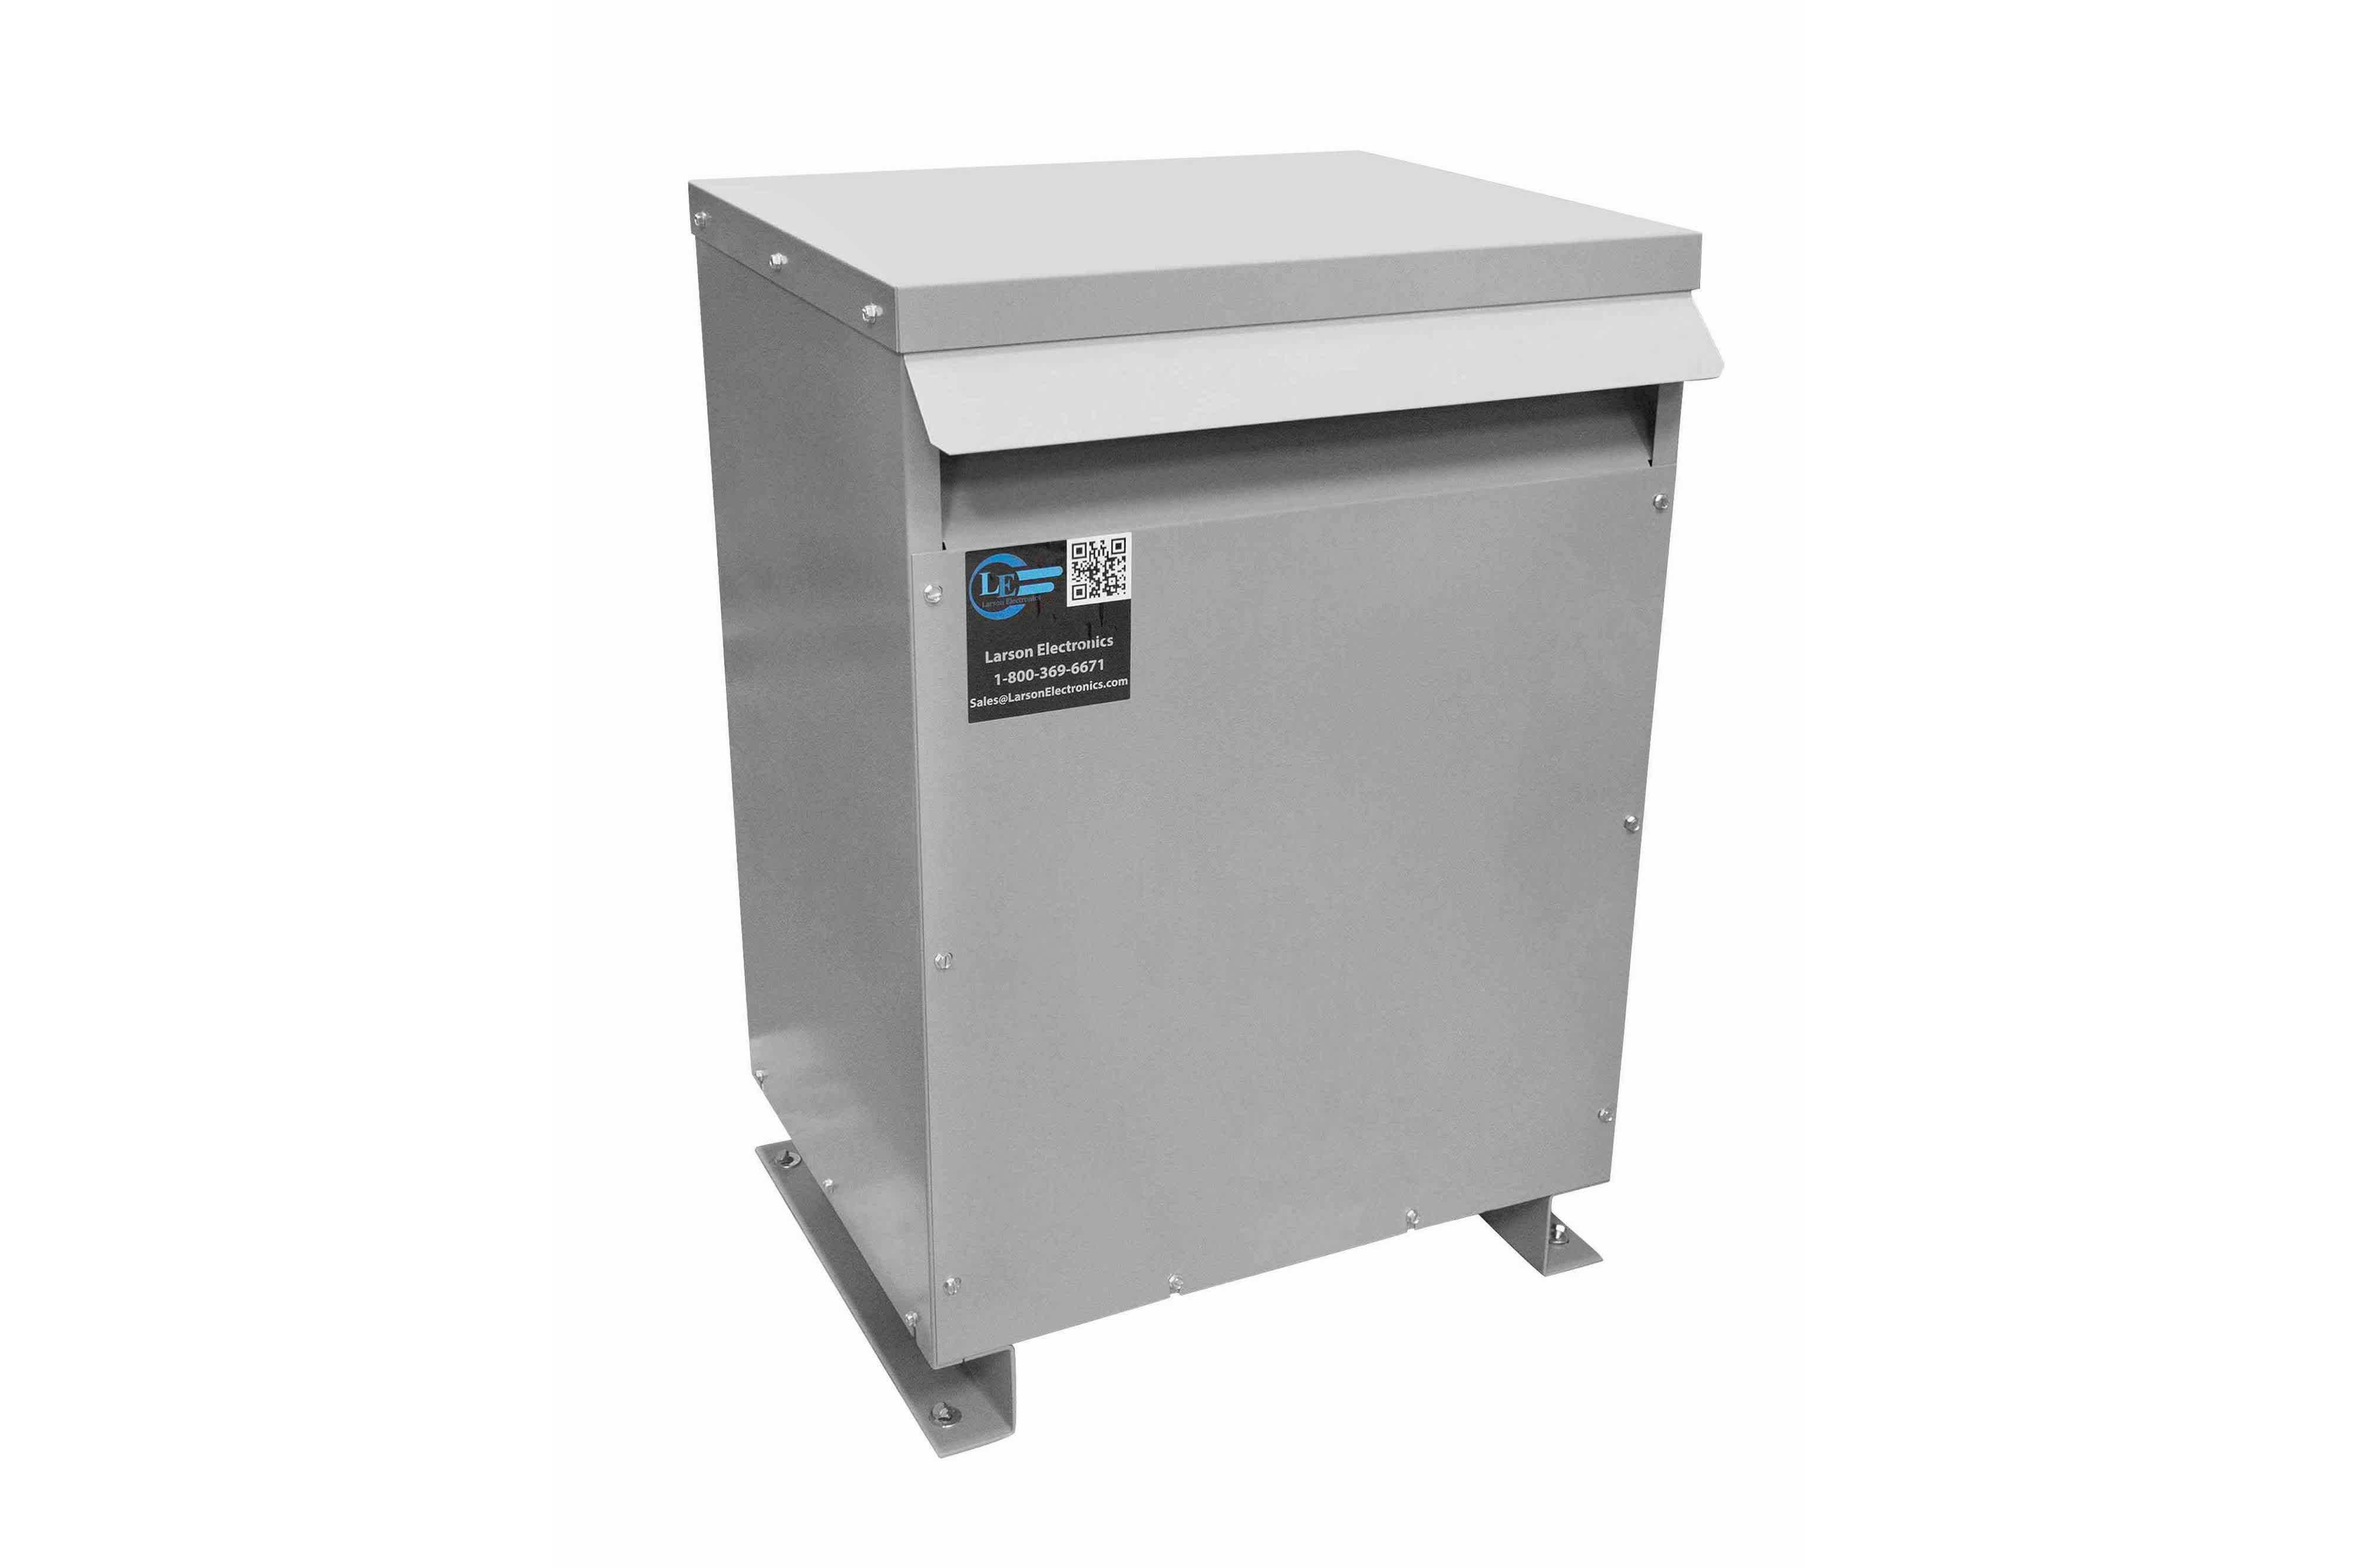 80 kVA 3PH DOE Transformer, 575V Delta Primary, 380Y/220 Wye-N Secondary, N3R, Ventilated, 60 Hz